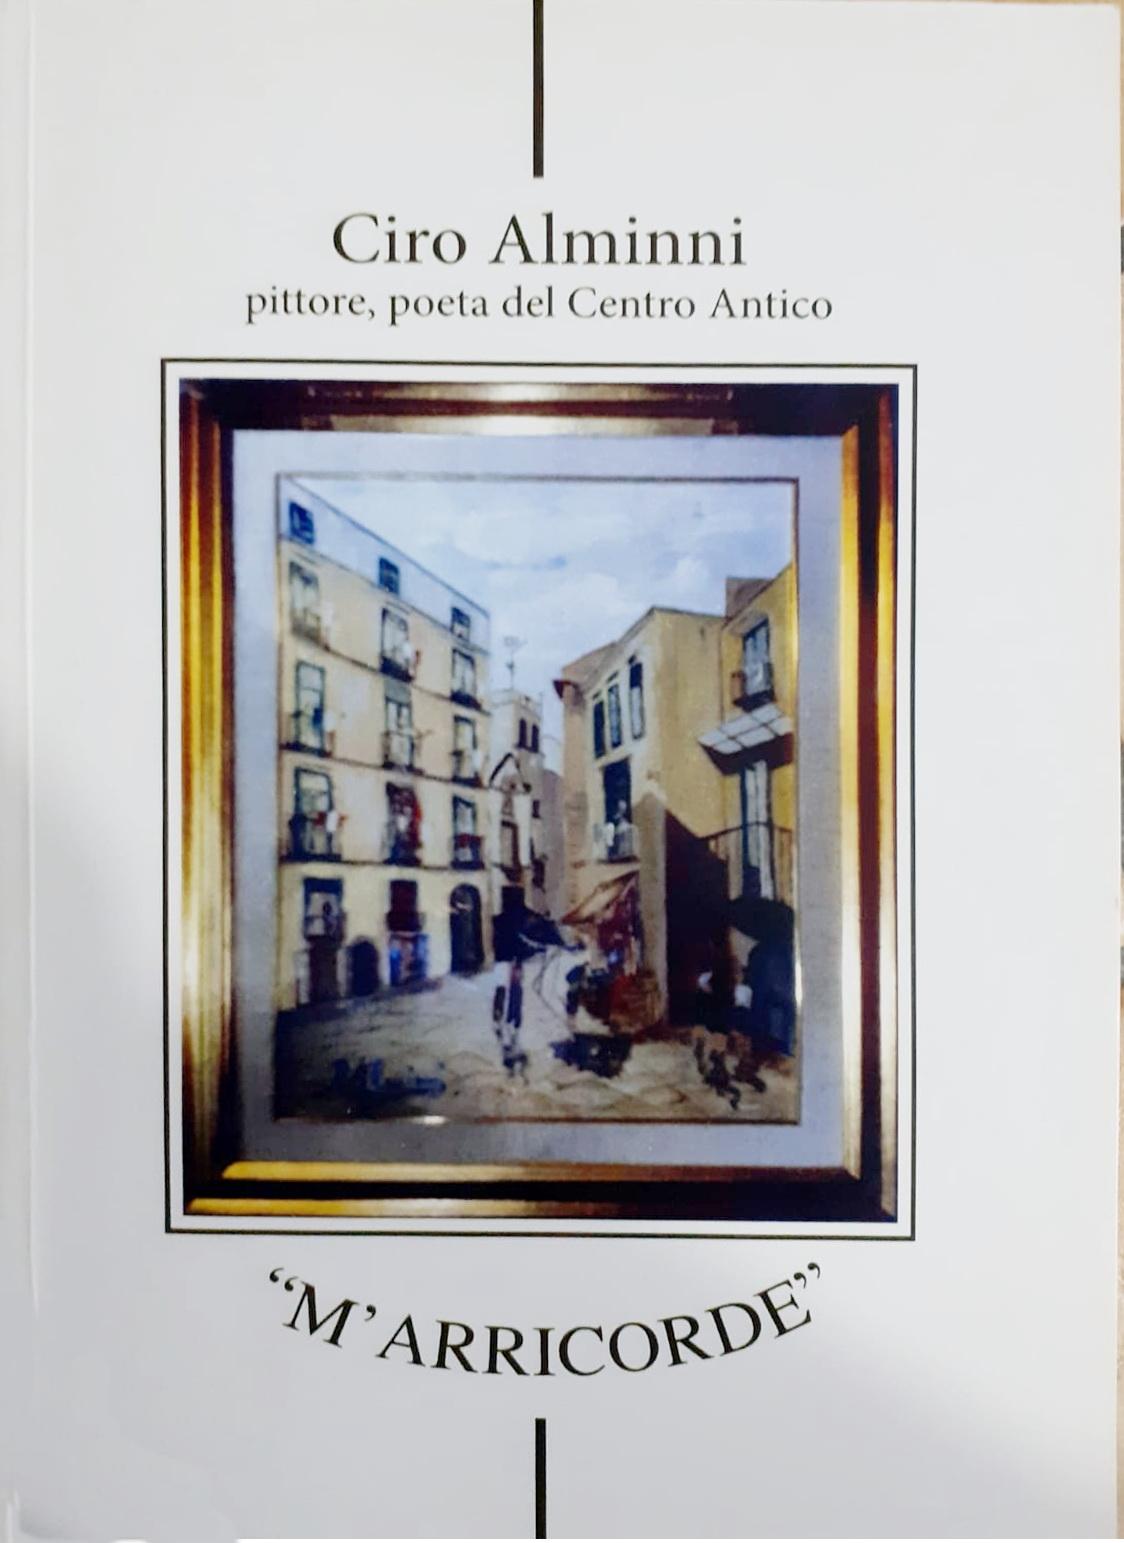 Marricorde. di Ciro Alminni,, raccolta di racconti